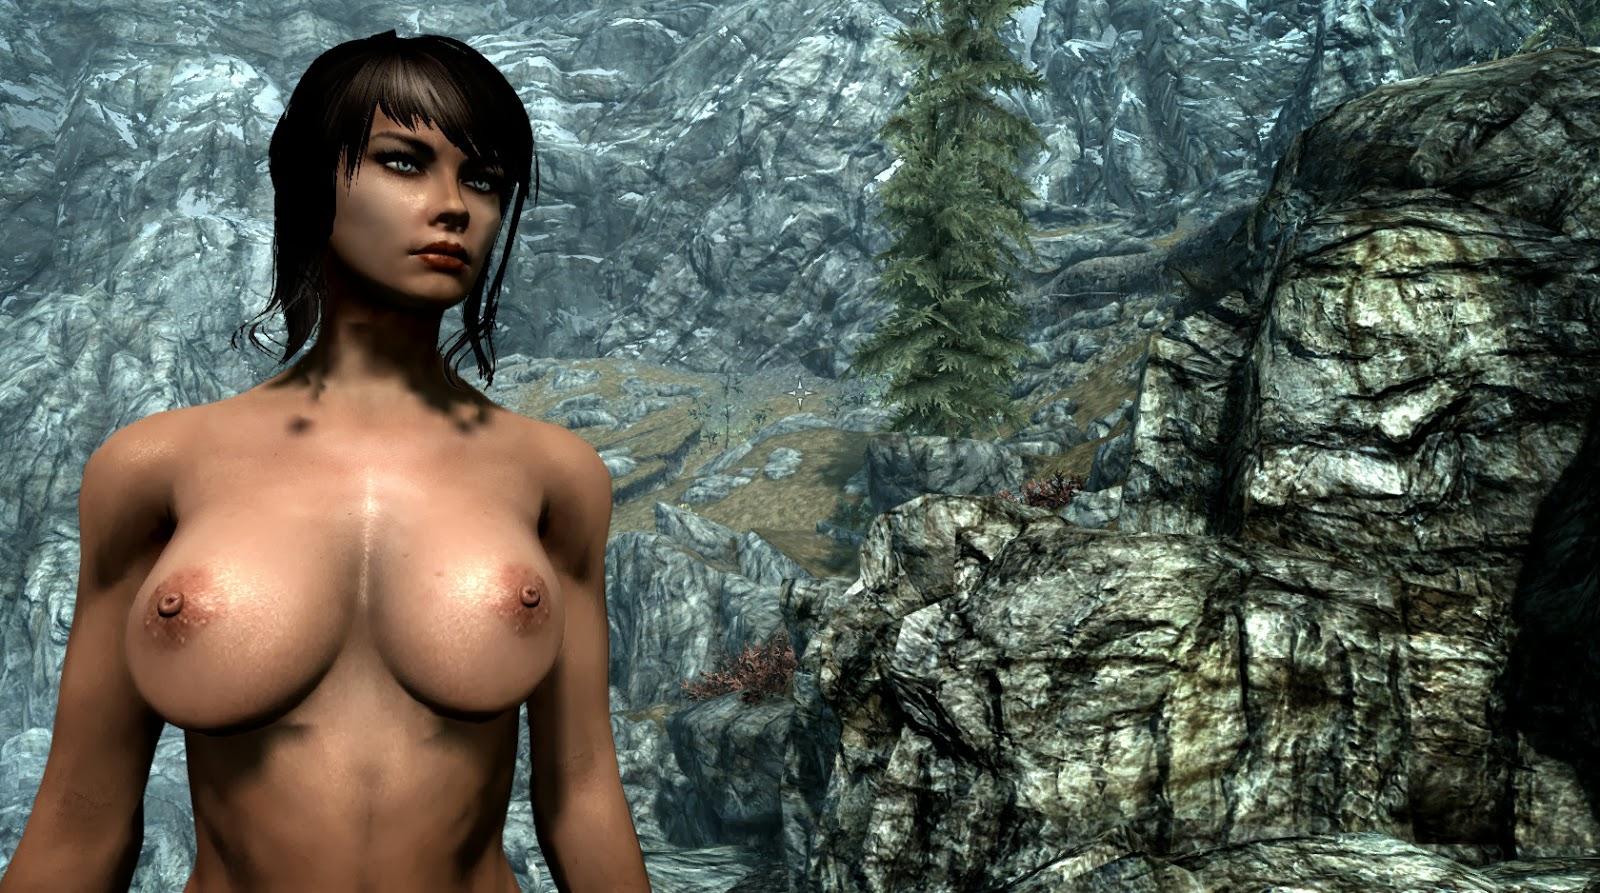 Skyrim nude skins naked clips